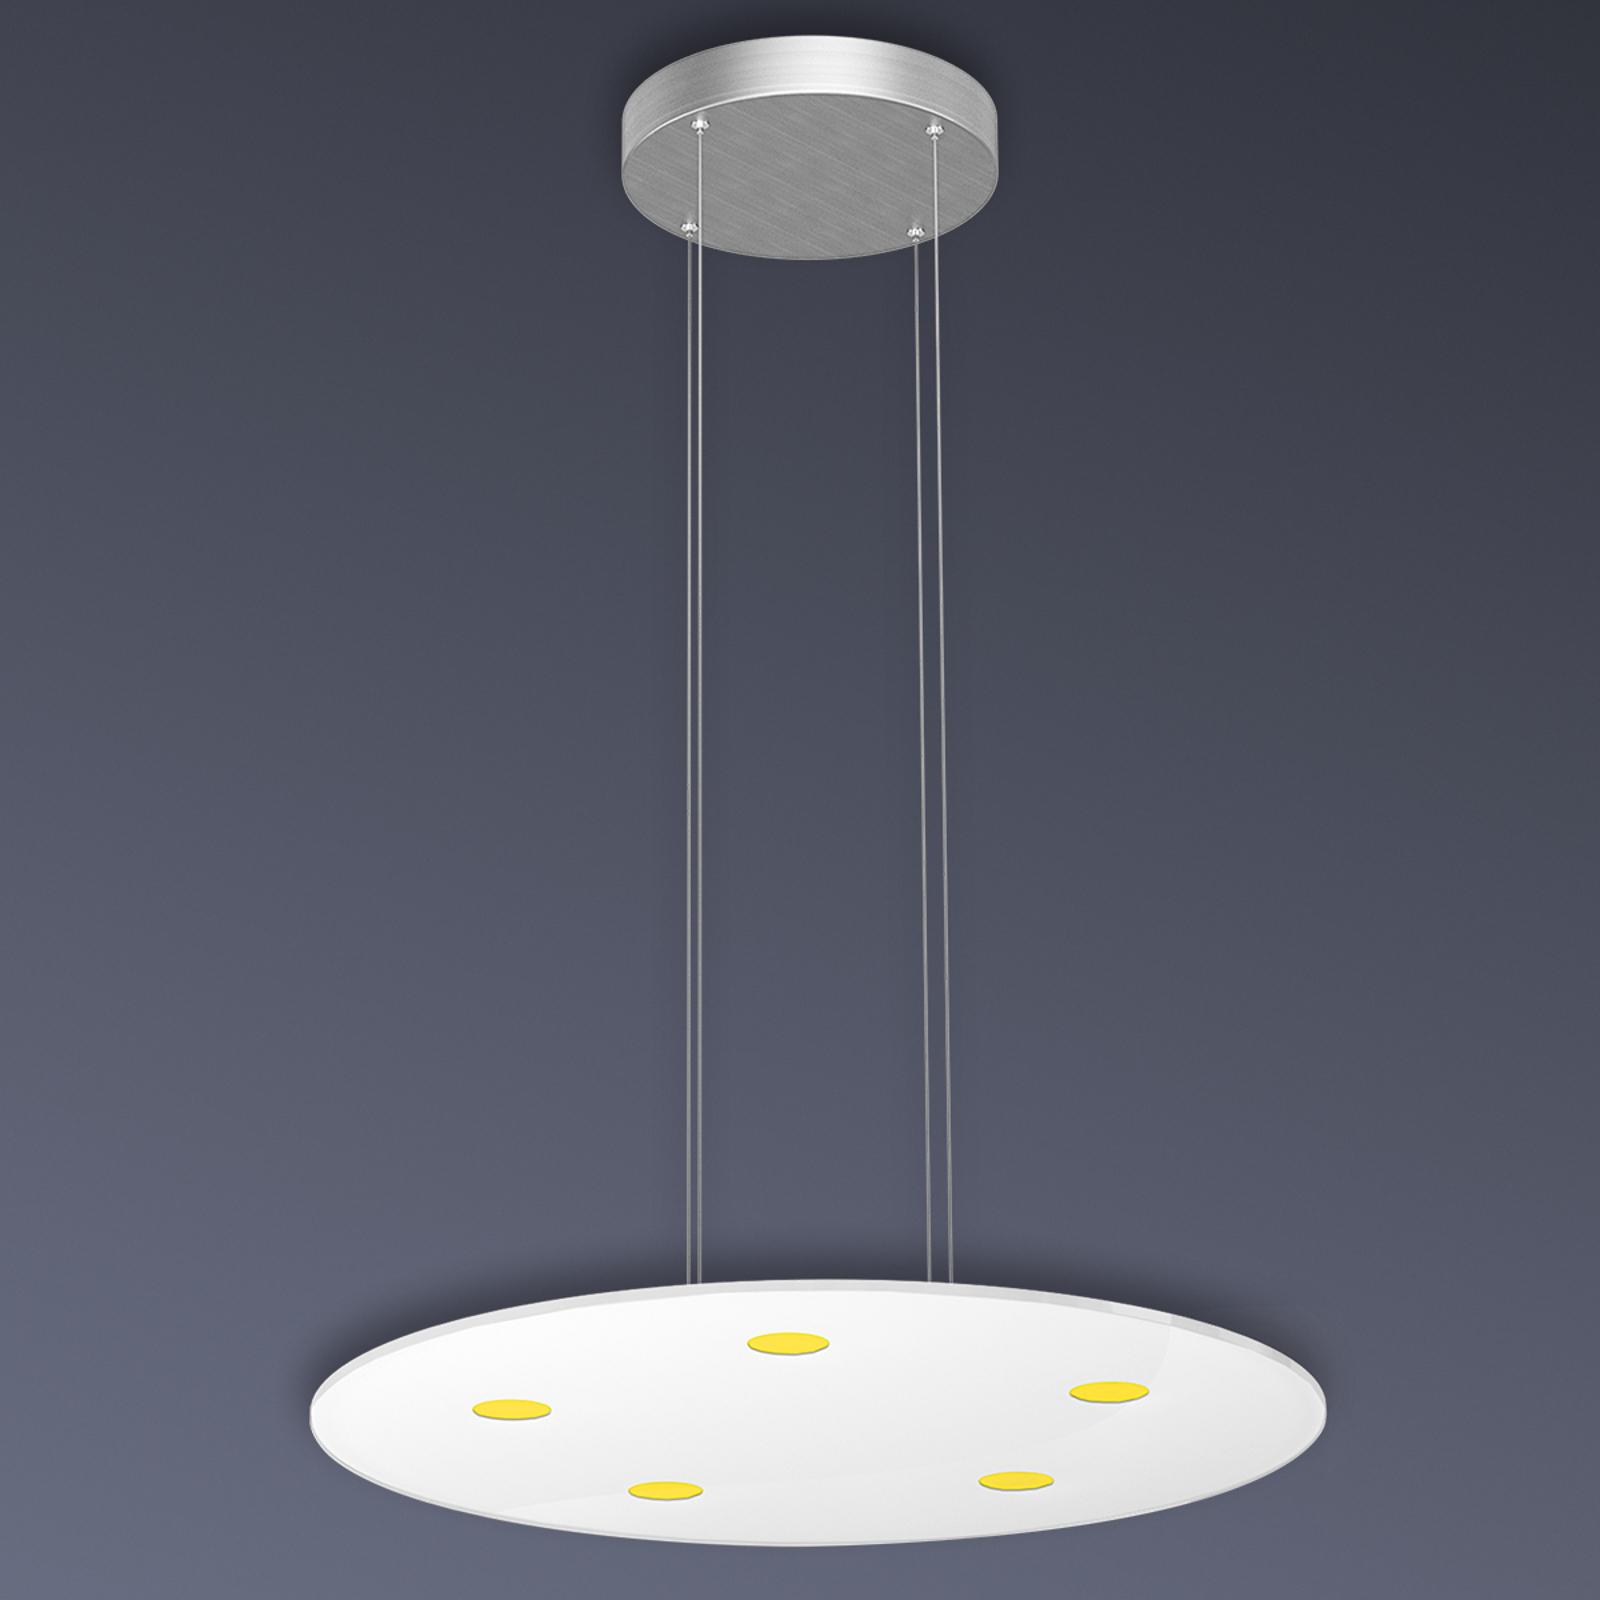 Runde LED-Pendelleuchte Sunia mit Touch-Dimmer